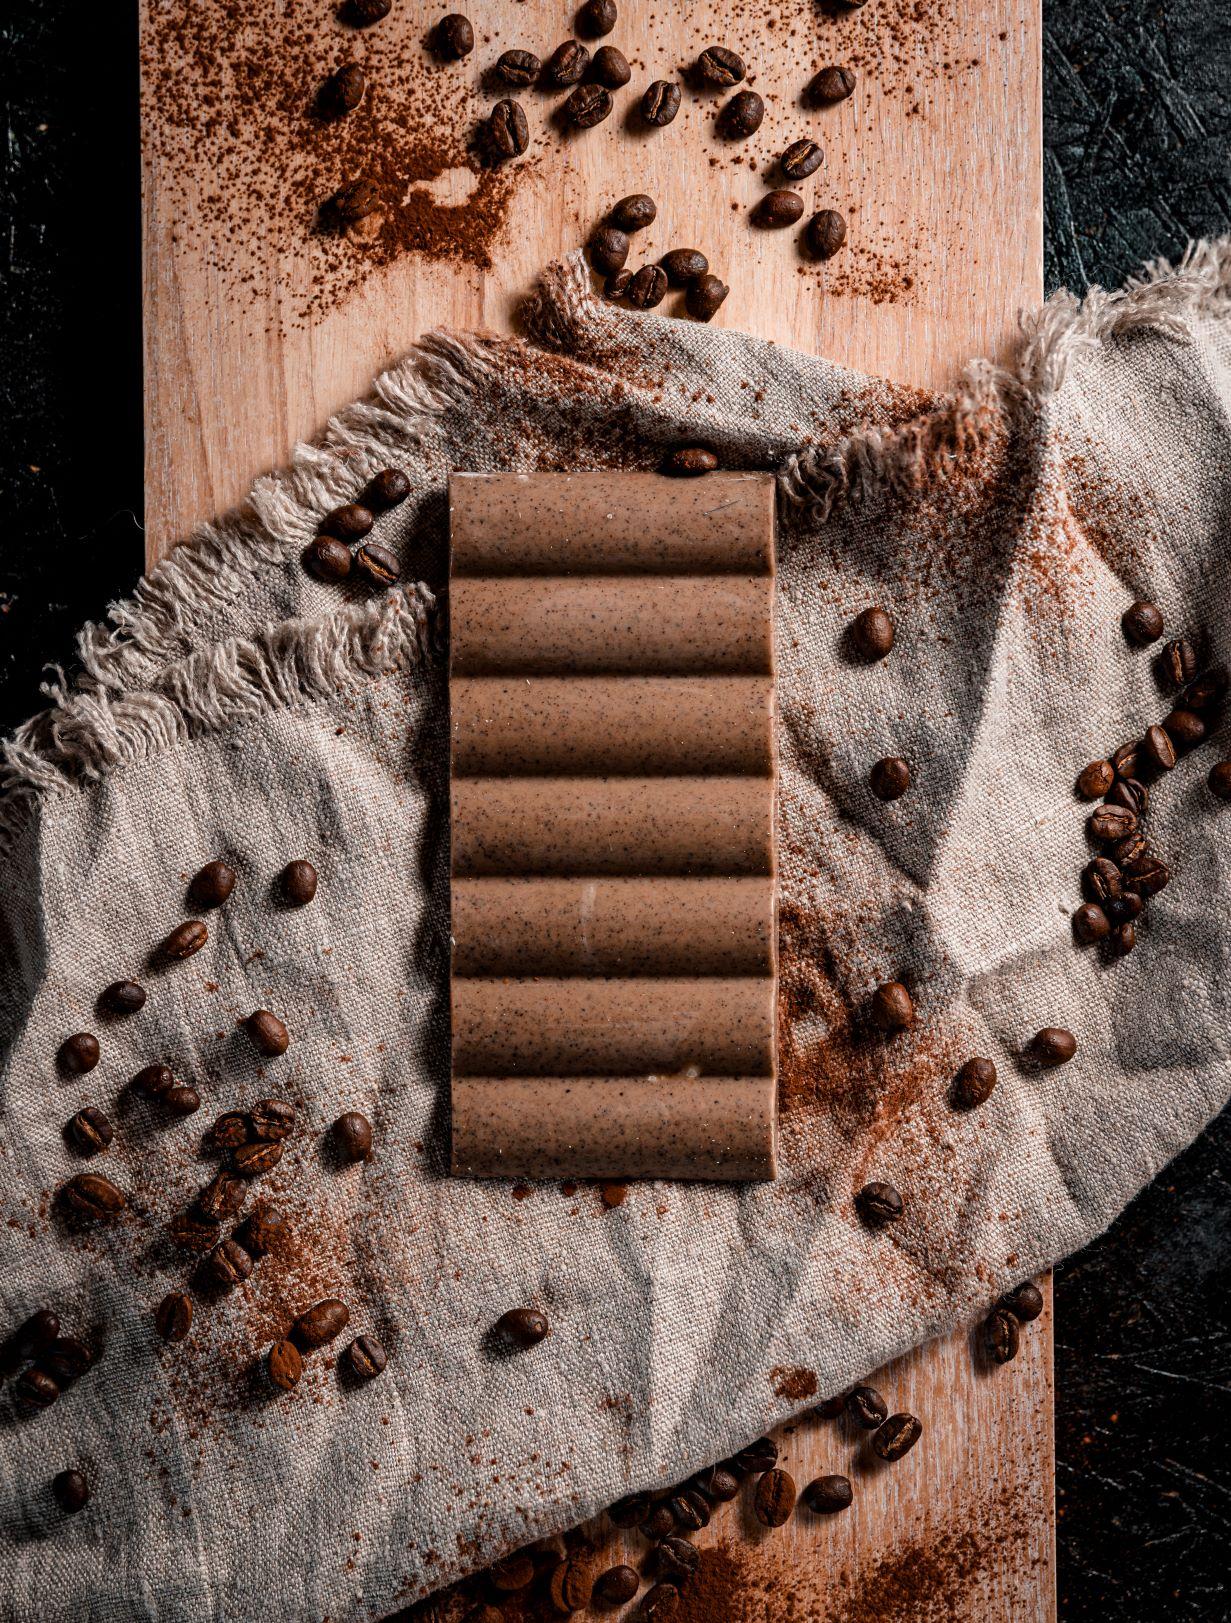 White Chocolate Cappuccino bar